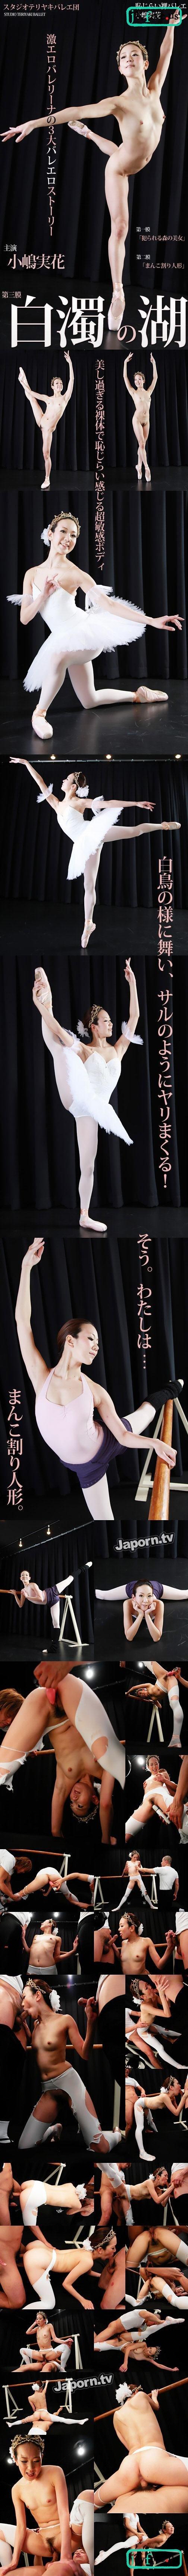 [BT 88] Shyness Nakid Ballet : Mika Kojima 小嶋実花 Mika Kojima BT